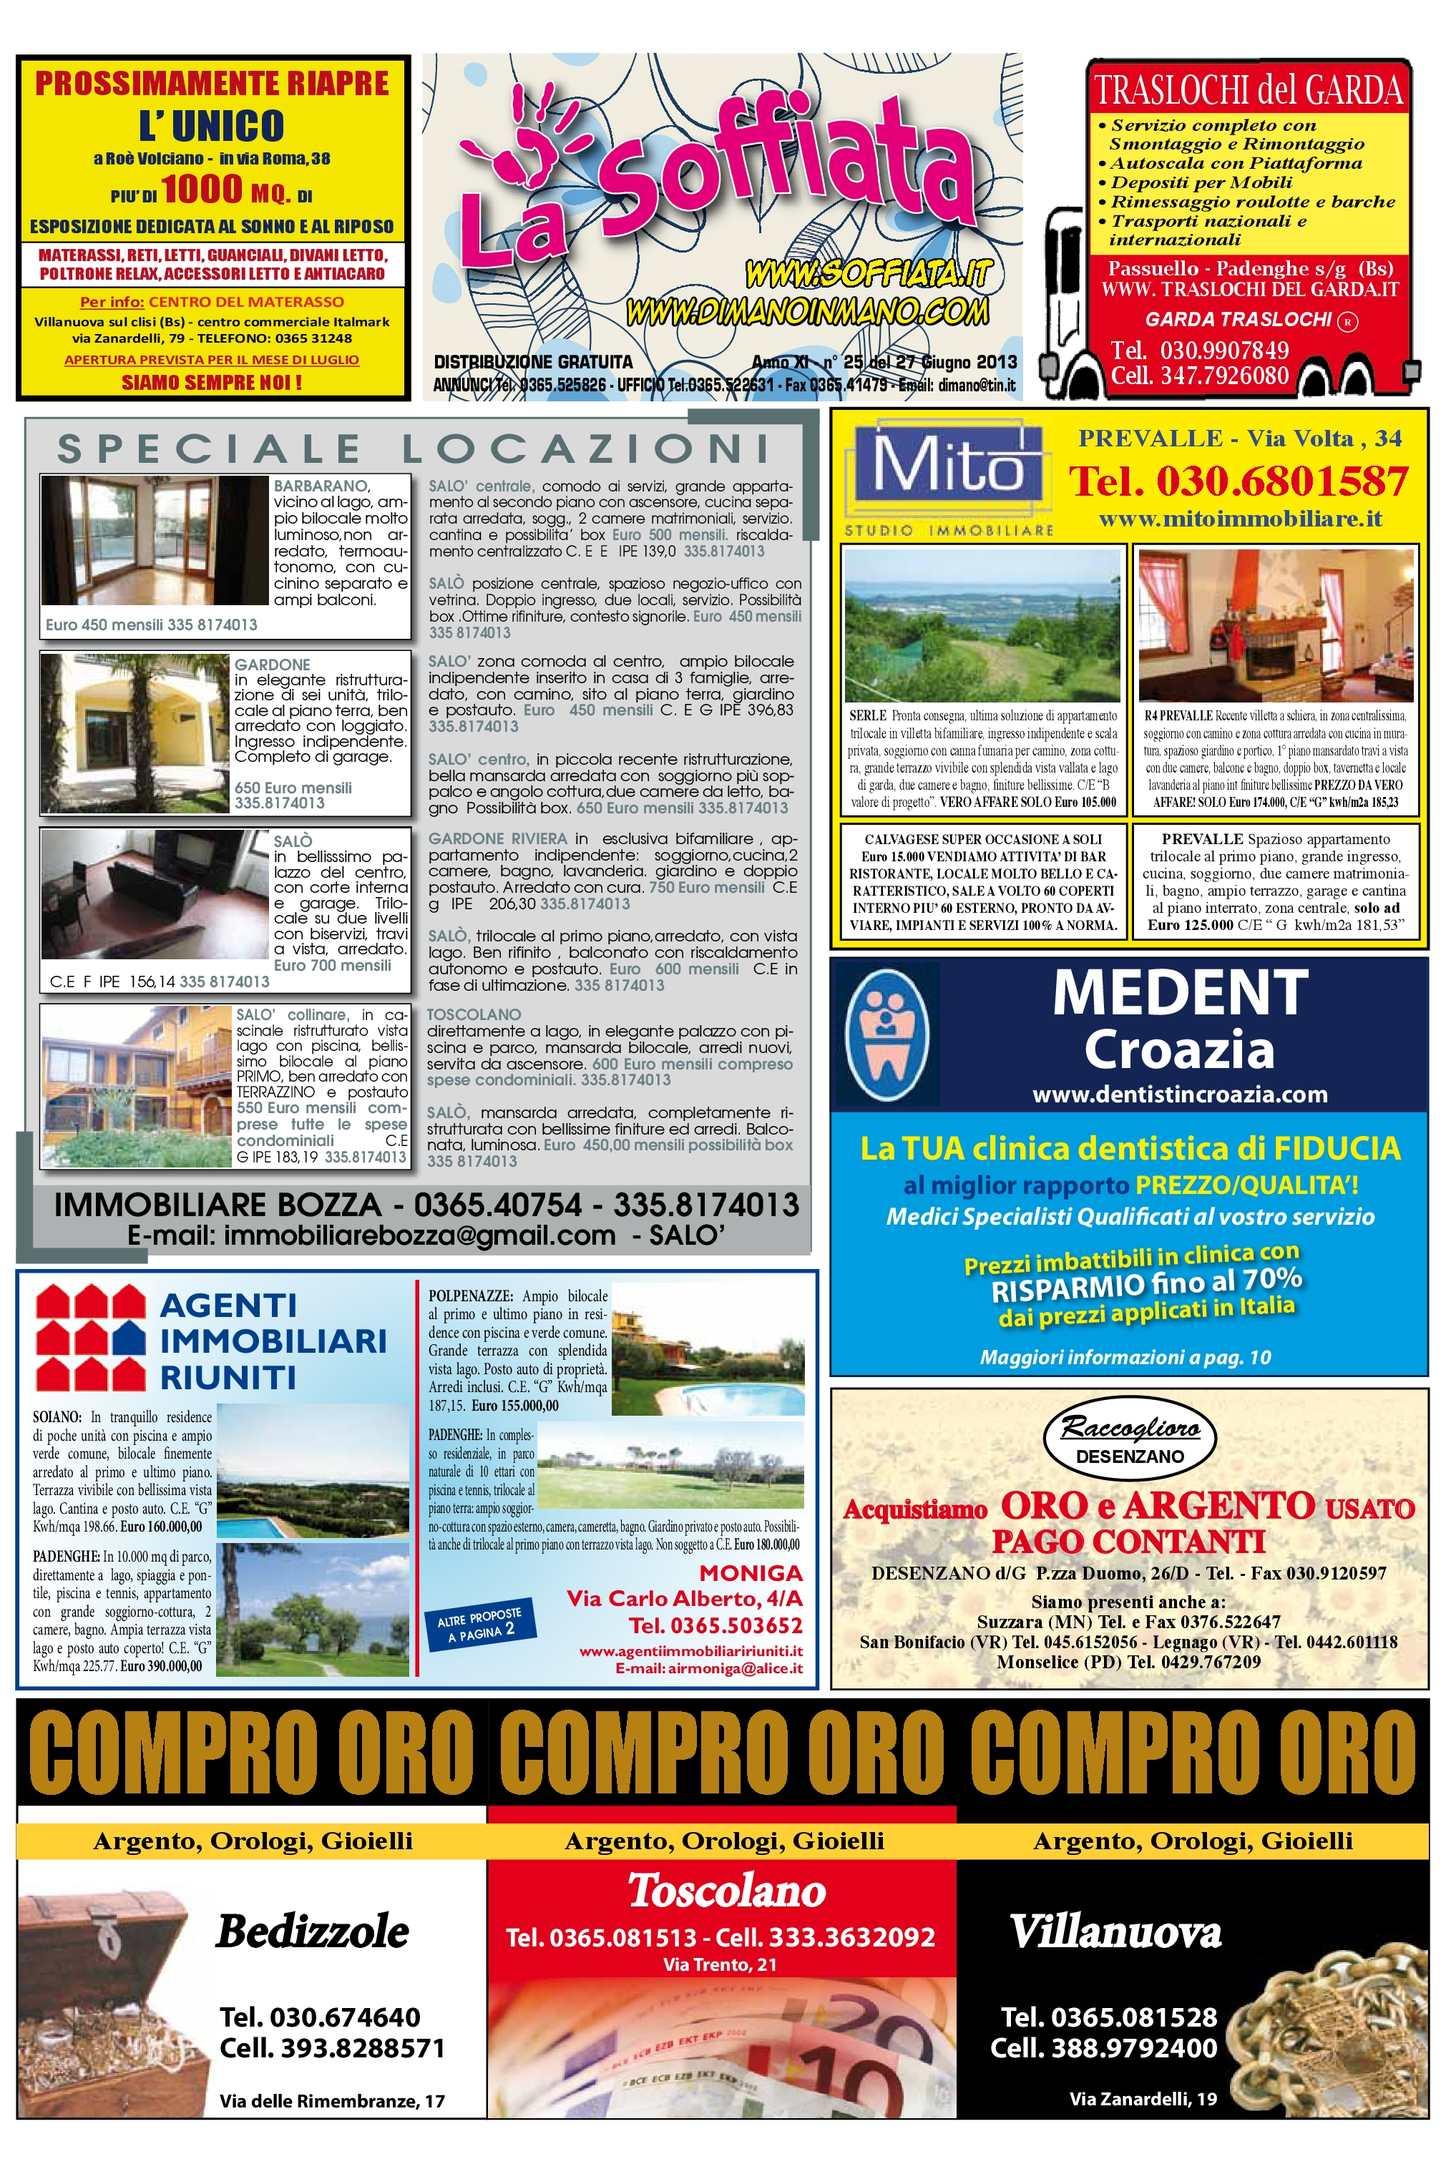 Calaméo - La Soffiata 27-06-2013 6be94b9bf57